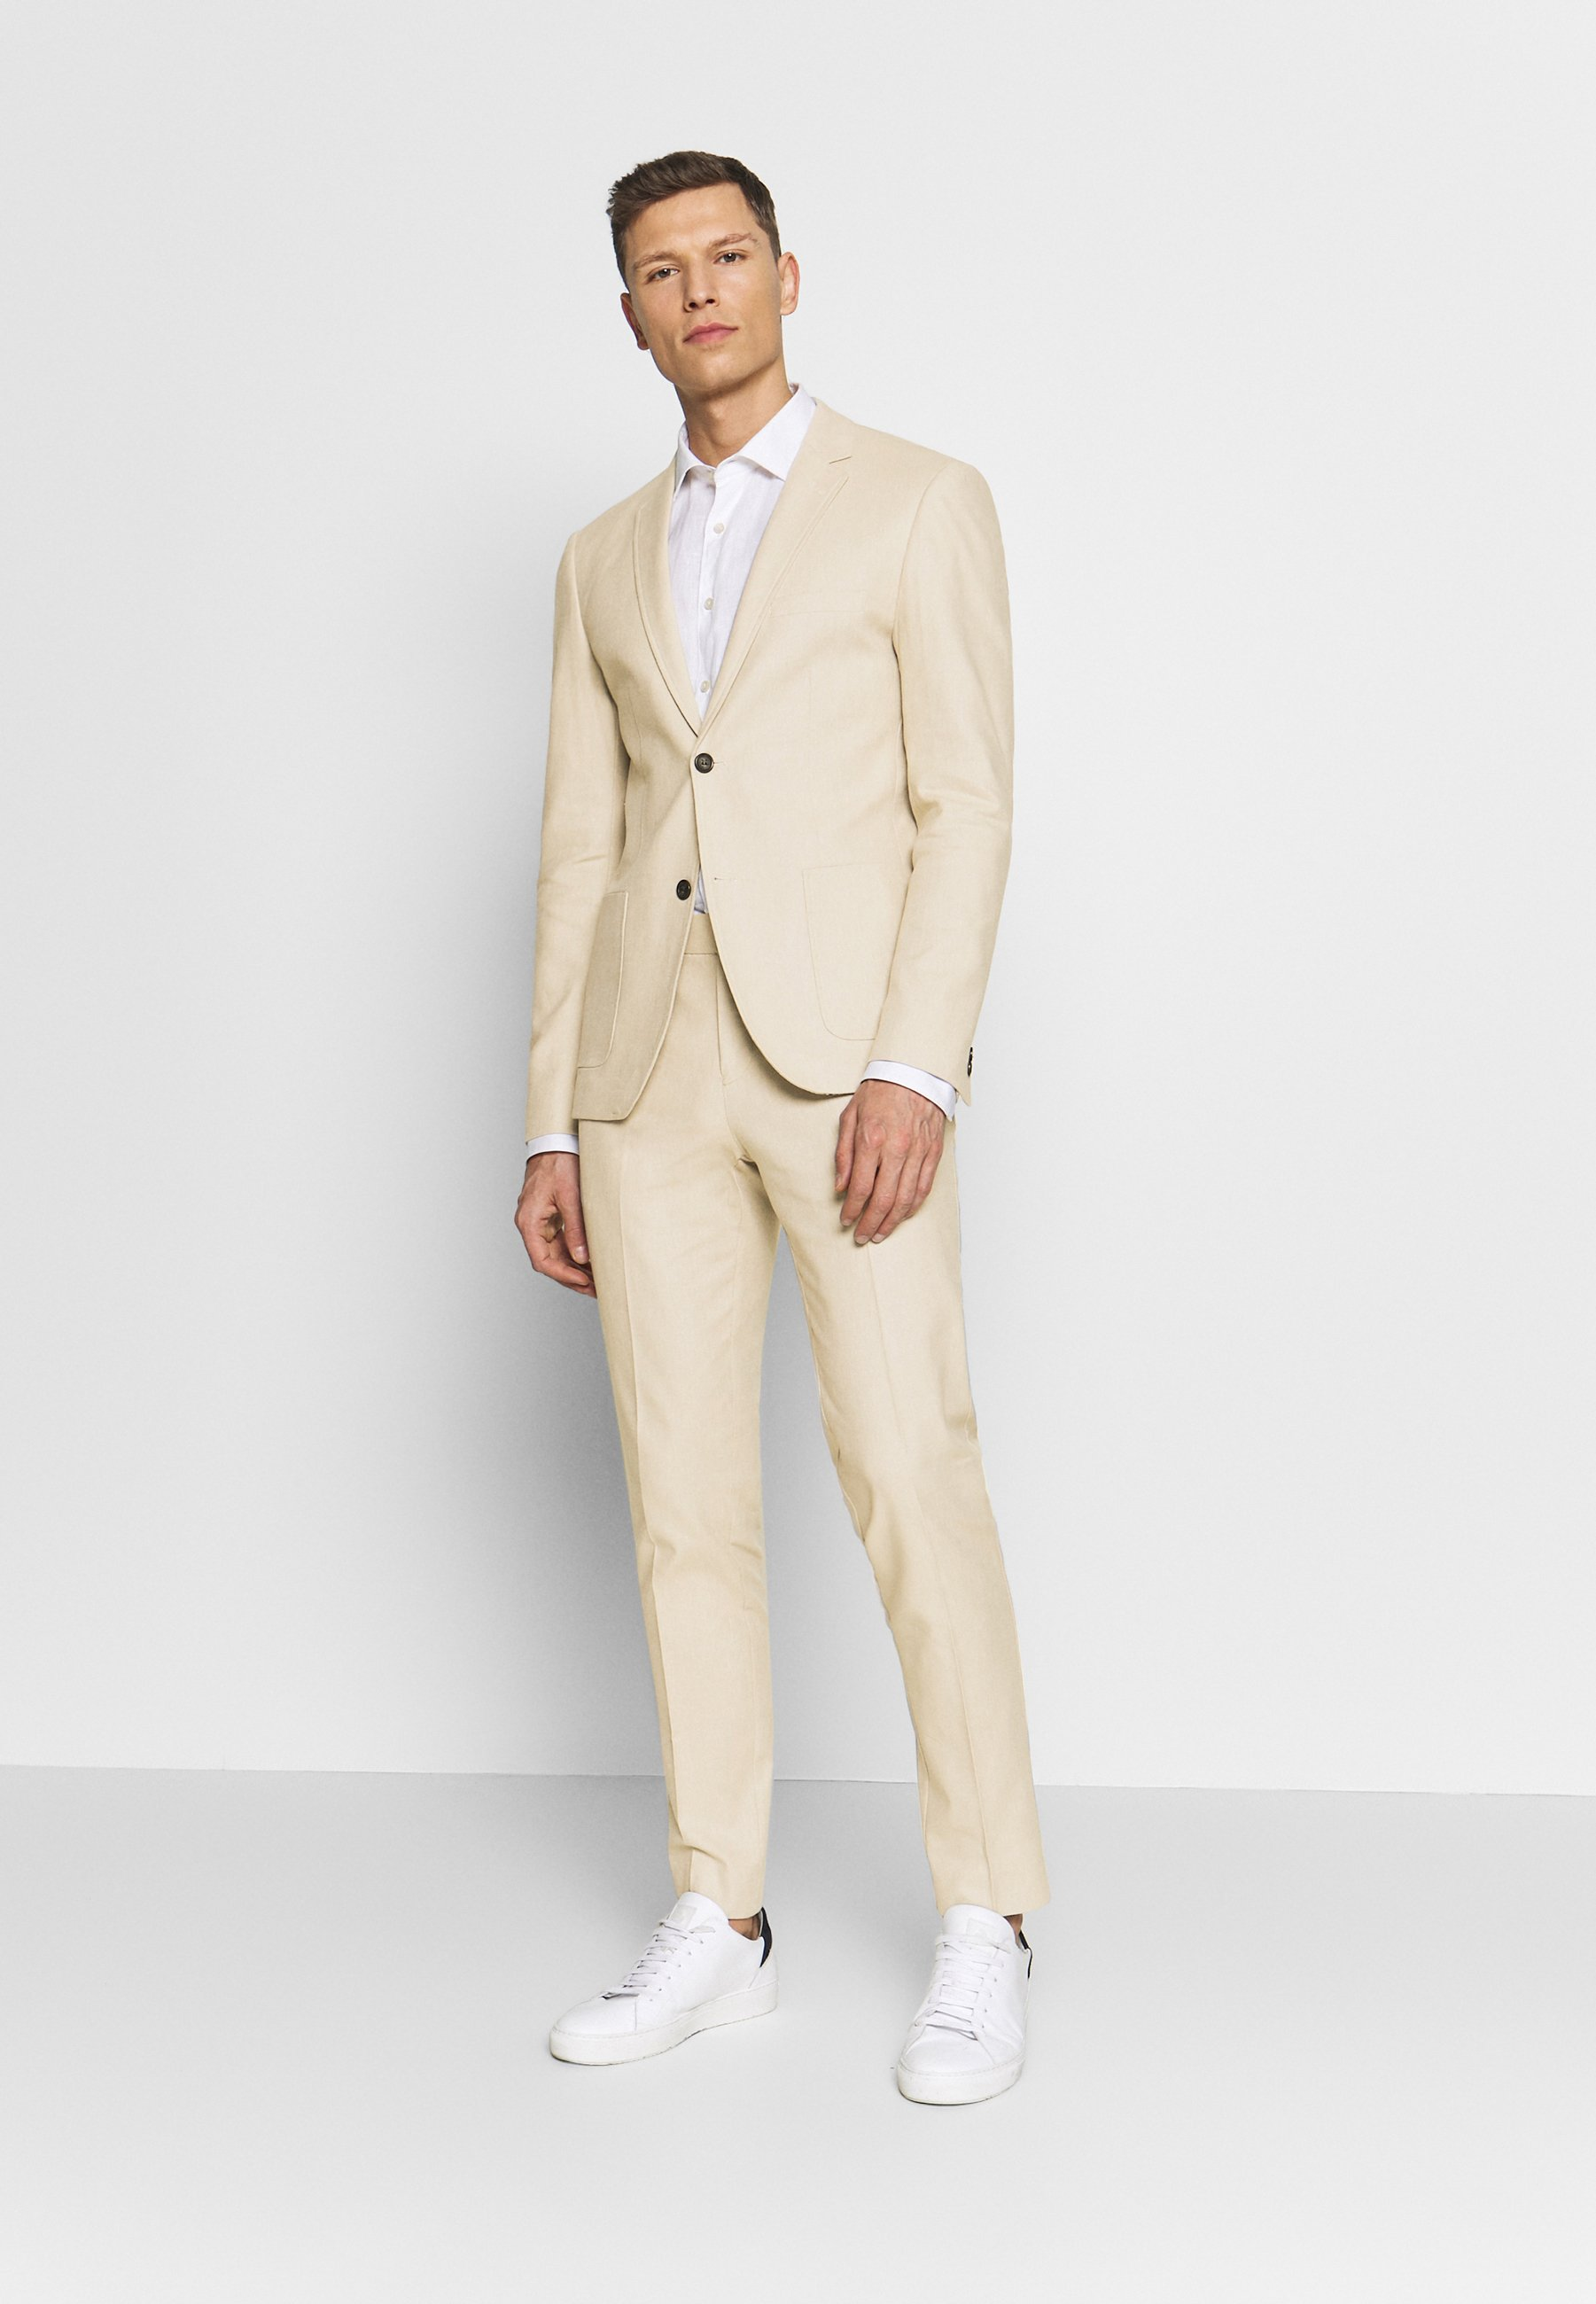 Klassinen Miesten vaatteet Sarja dfKJIUp97454sfGHYHD Lindbergh Puku sand mix